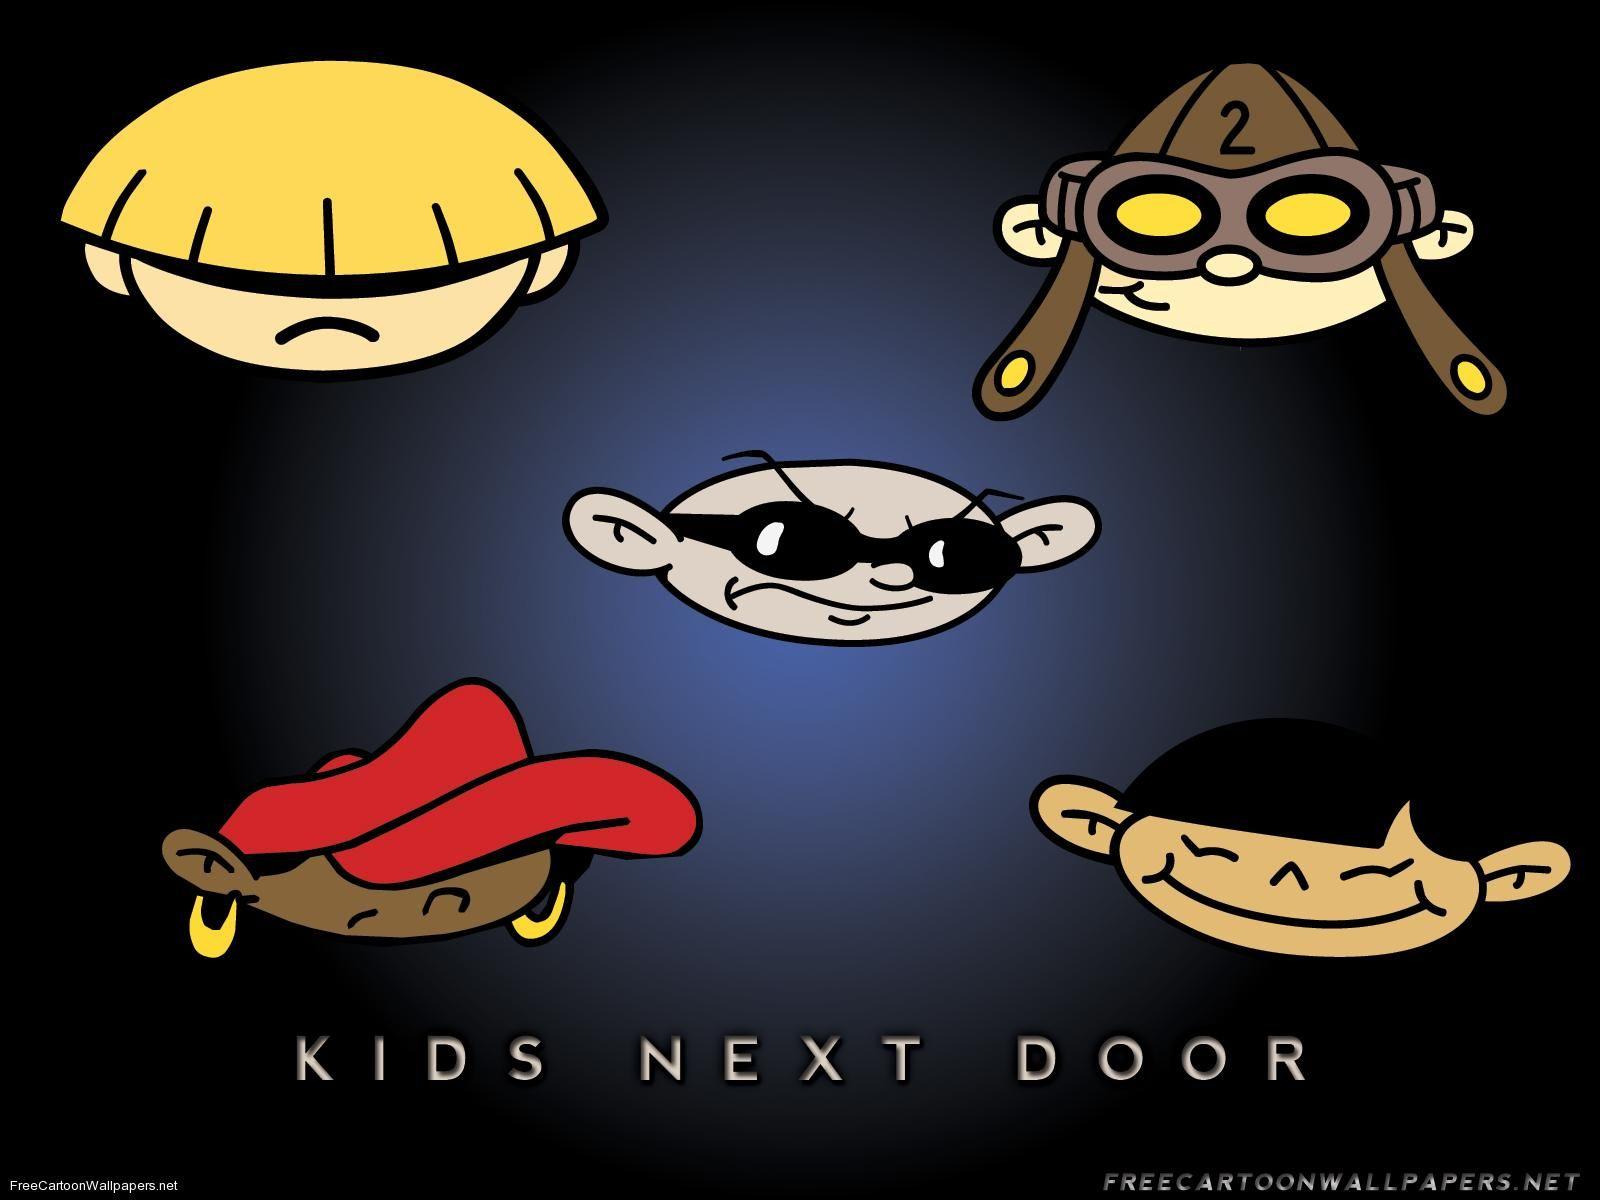 Free codename kids next door pictures and wallpapers cartoon network - Codename Kids Next Door